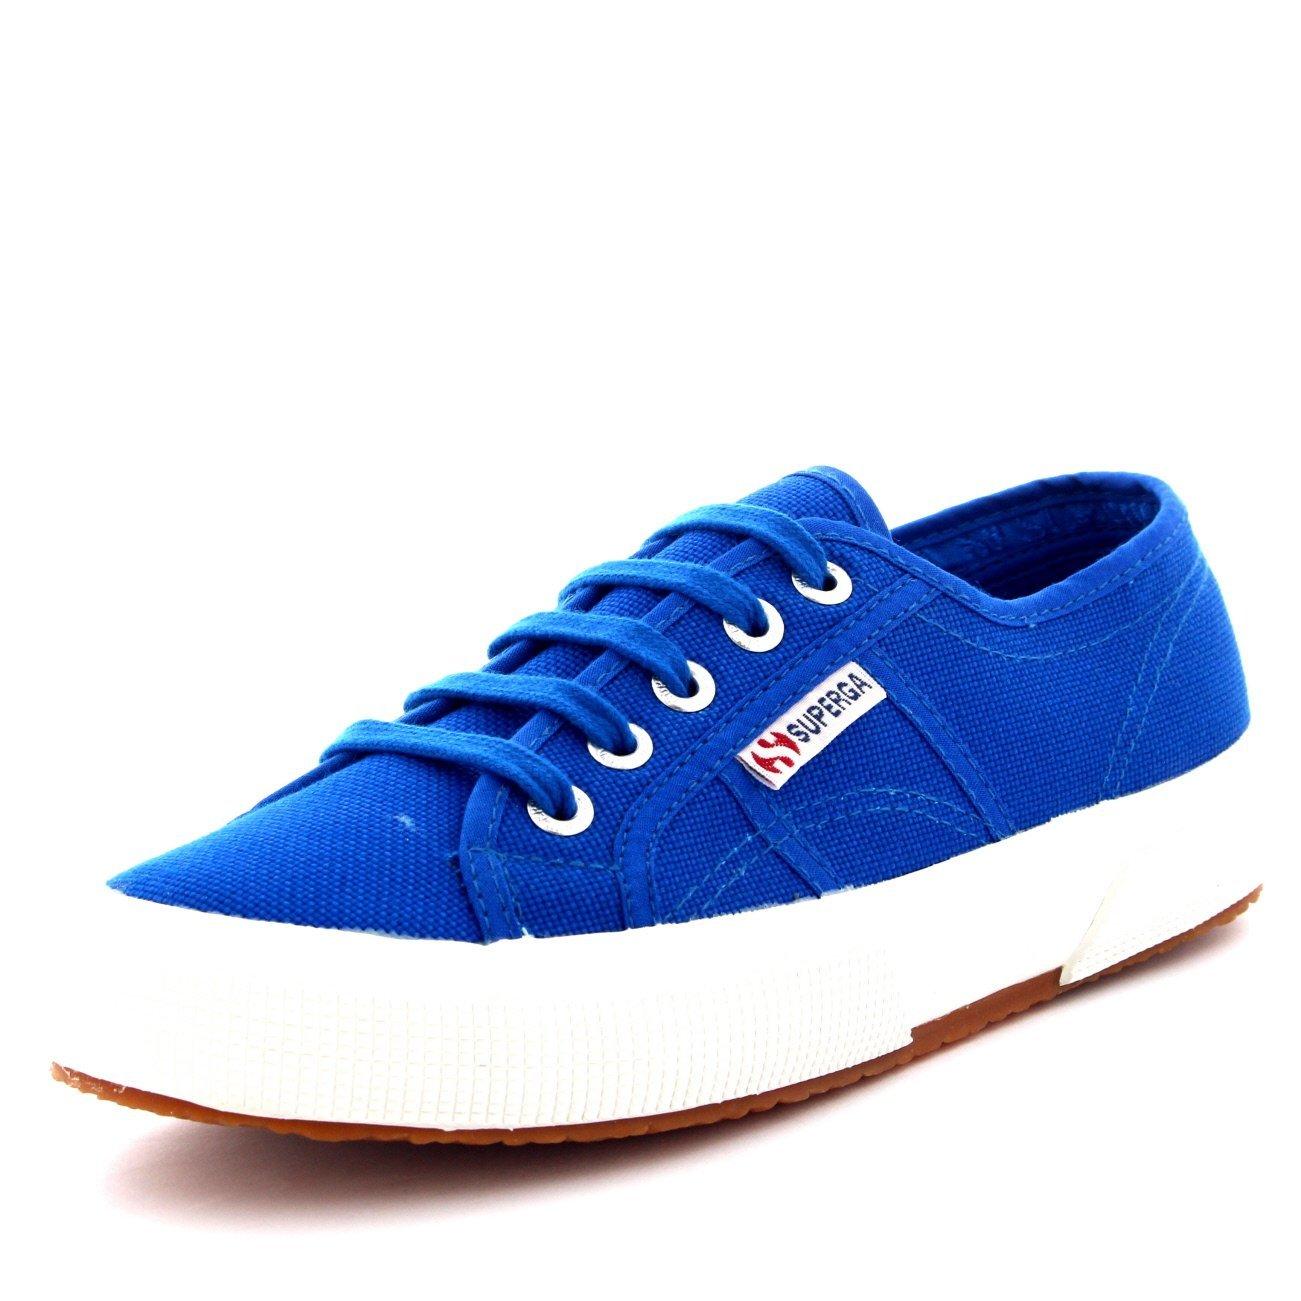 Superga 2750 Cotu Classic, Baskets mixte adulte Bleu Bleu B076DFKHN3 (G03 Superga Sea Blue) 43b28f2 - fast-weightloss-diet.space